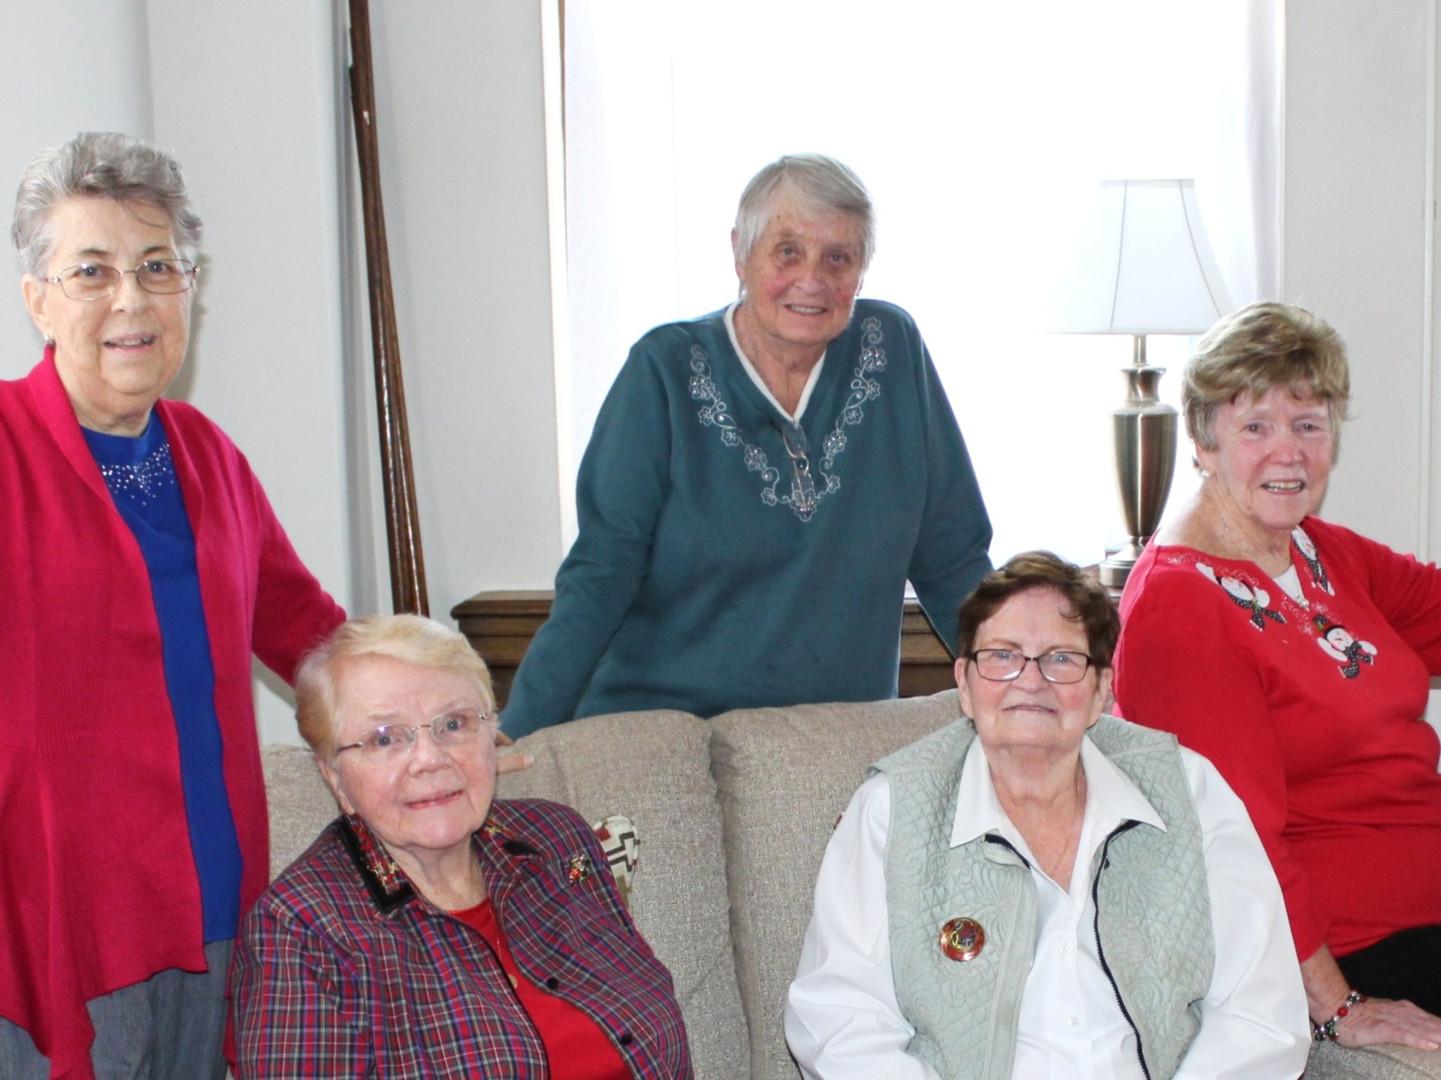 Sisters Joan Smith, Bernadette Burke, Mary Malone, and Alice Kirk